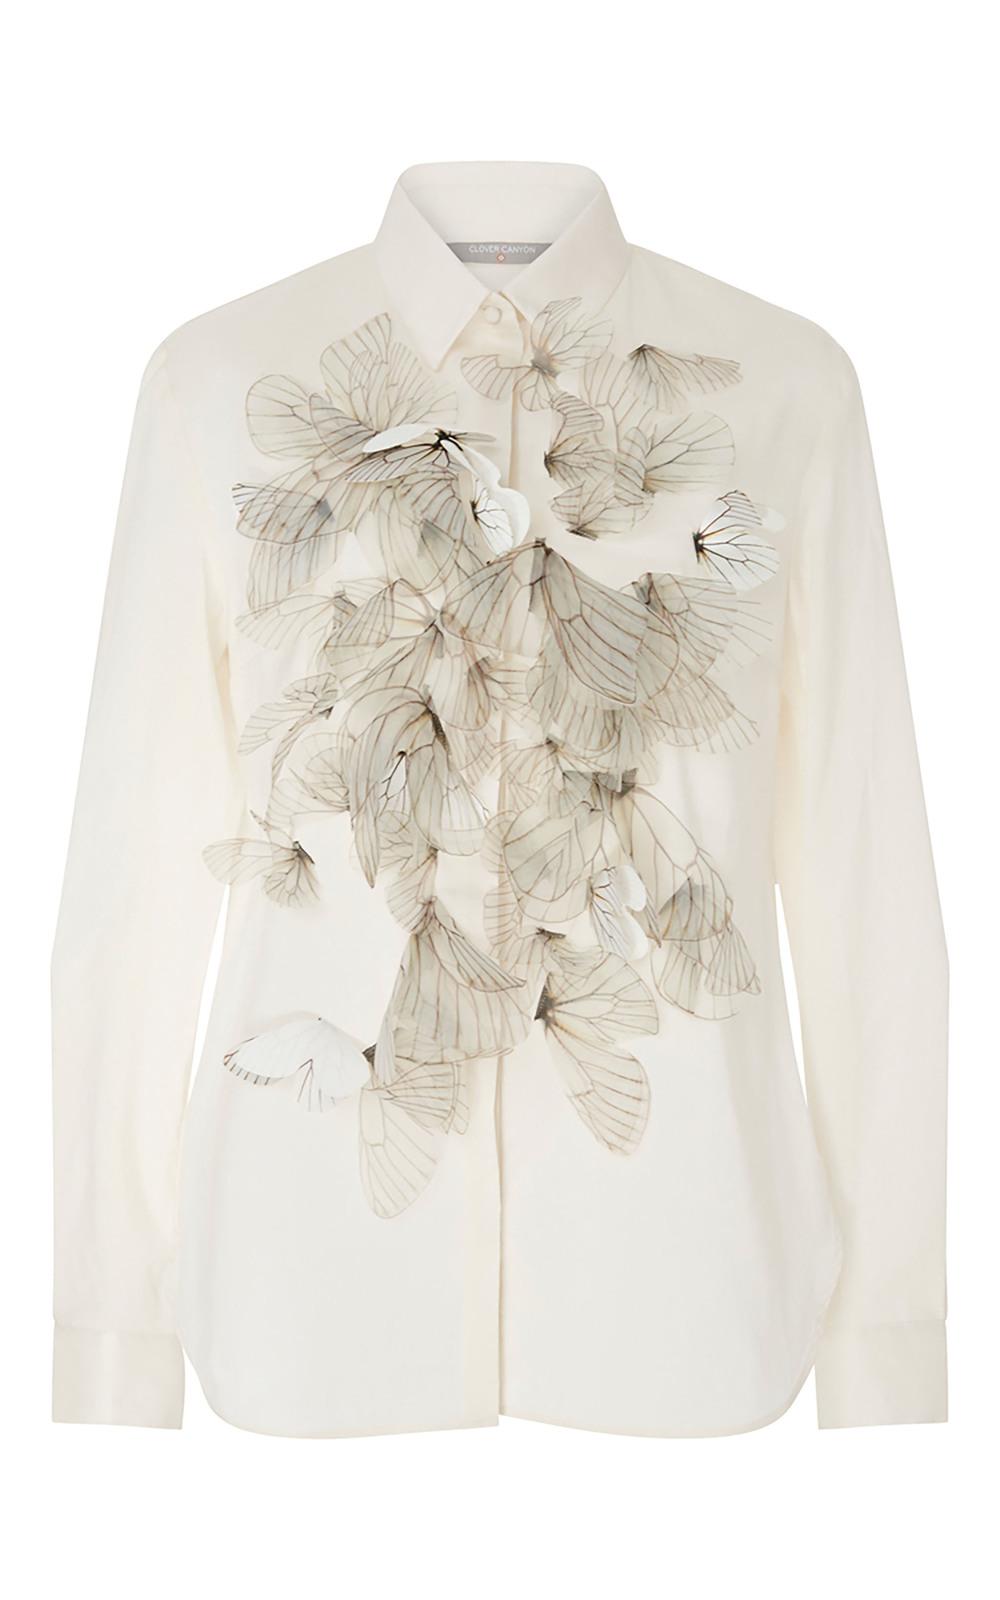 Clover Canyon立體蝴蝶裝飾襯衣  US$395